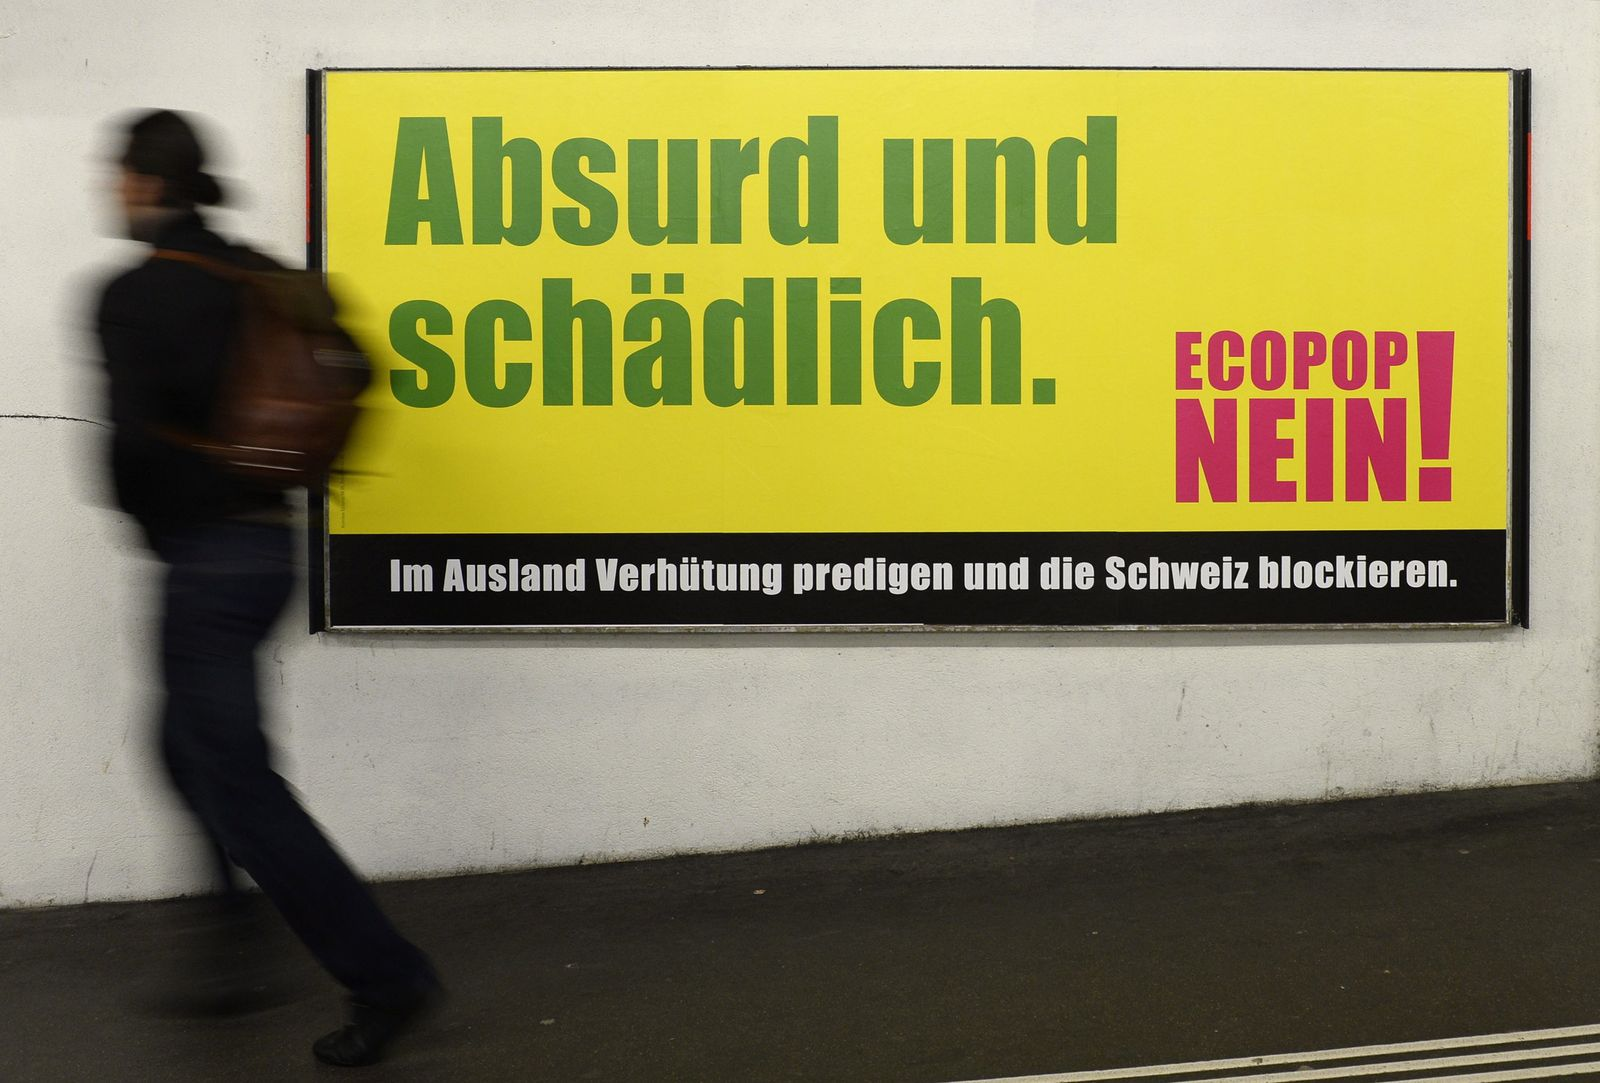 Ecopop initiative Schweiz